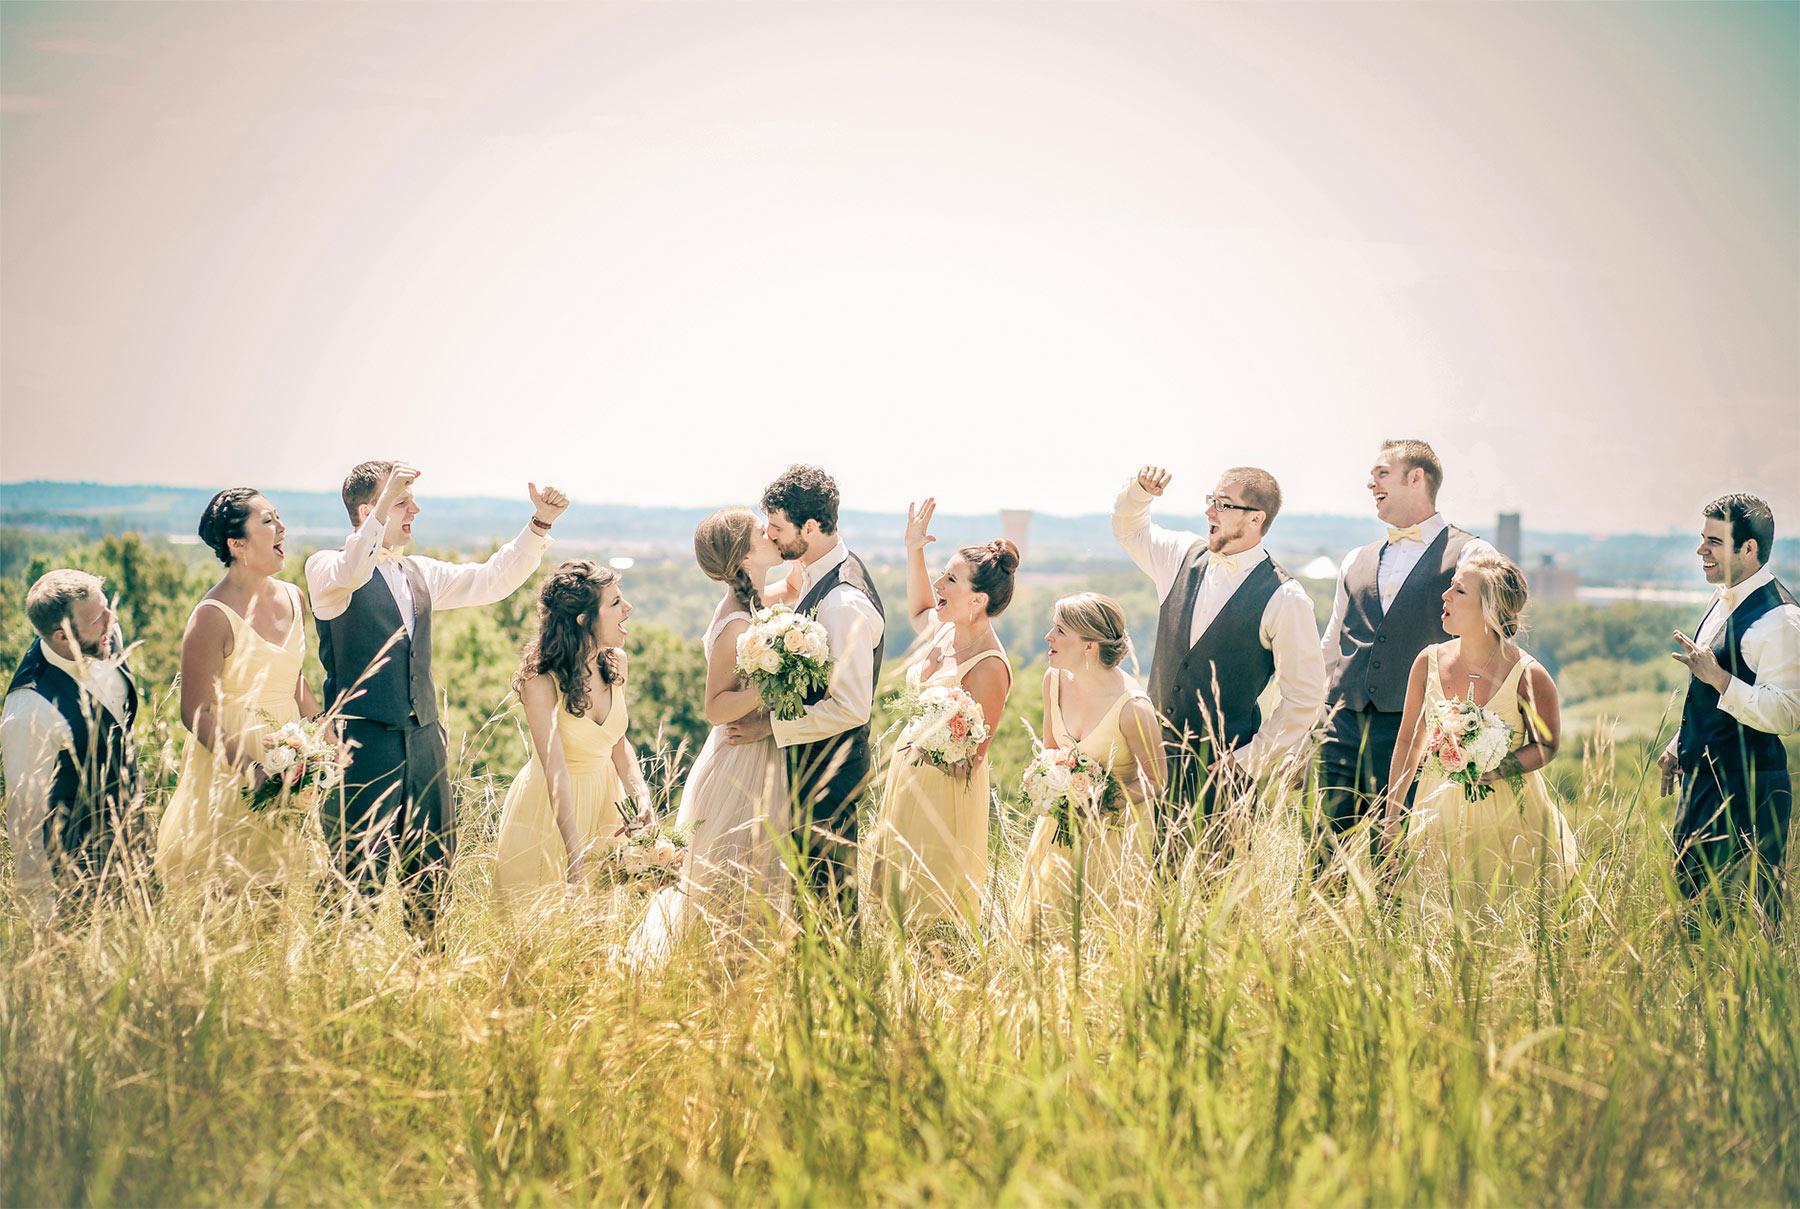 05-Minneapolis-Minnesota-Wedding-Photography-by-Vick-Photography-Field-Blue-Sky-Wedding-Party-Group-Sarah-&-Tom.jpg